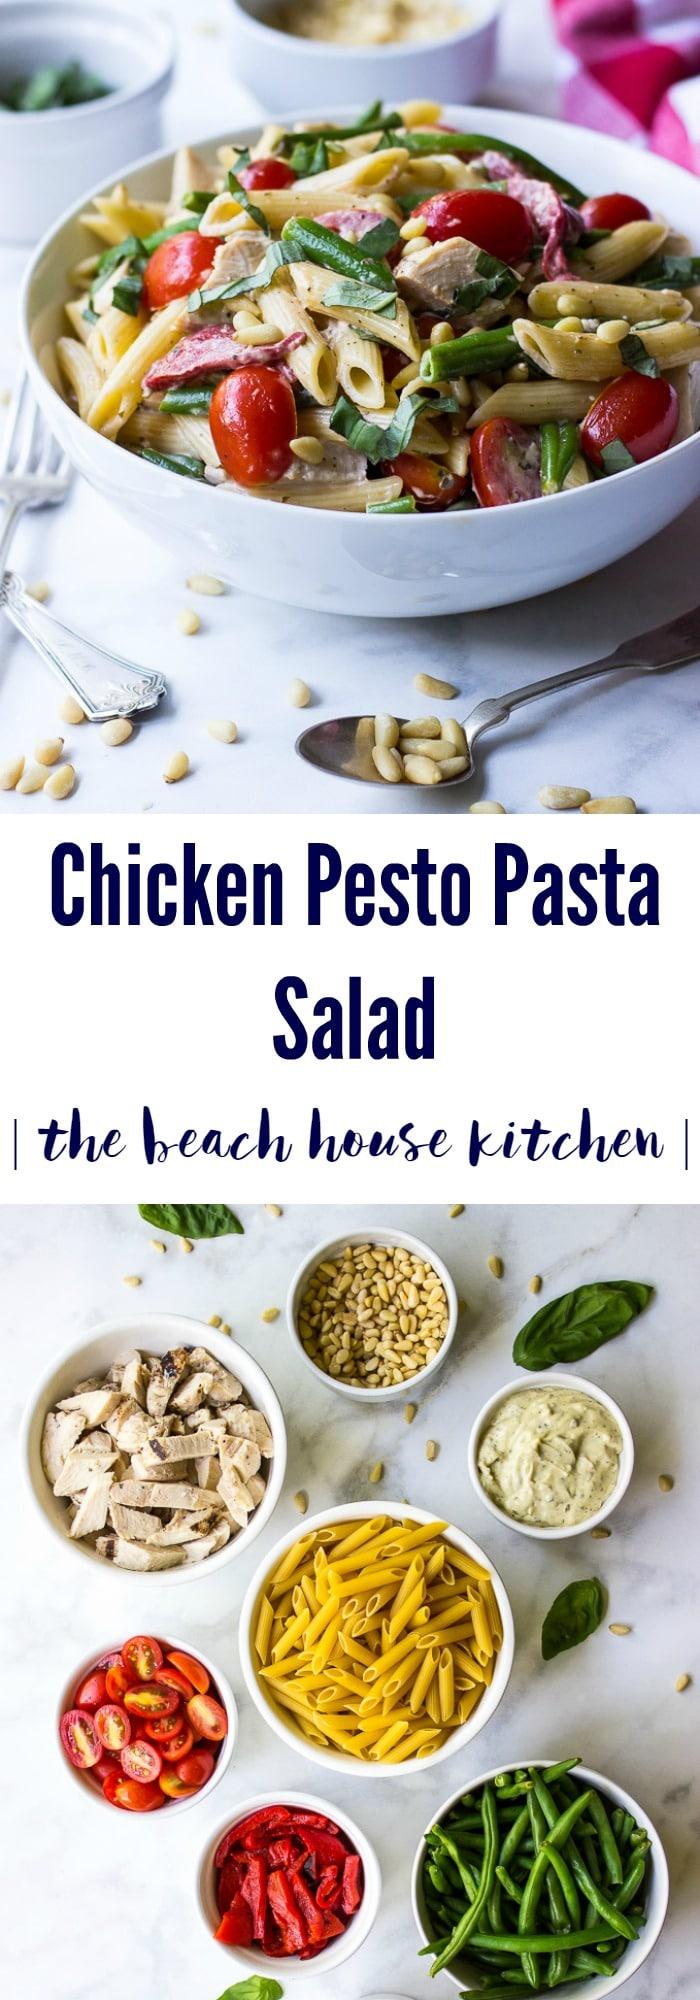 Chicken Pesto Pasta Salad